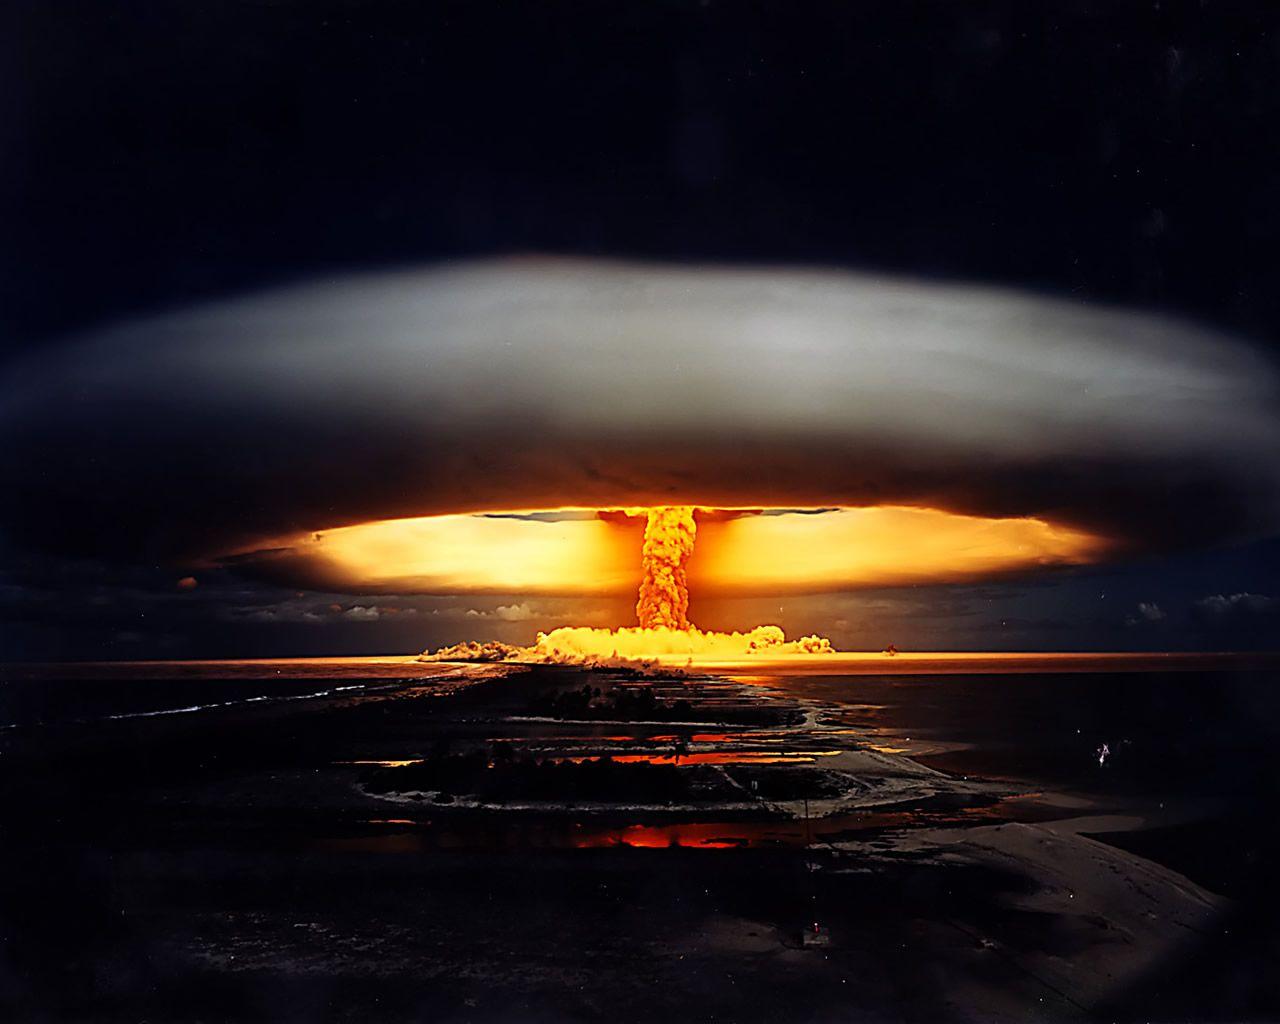 Hd Wallpapers Hd Wallpapers Desktop Hd Wallpapers Desktop Hd Wallpapers Desktop Hd Atomic Bomb Mushroom Cloud Nuclear Bomb